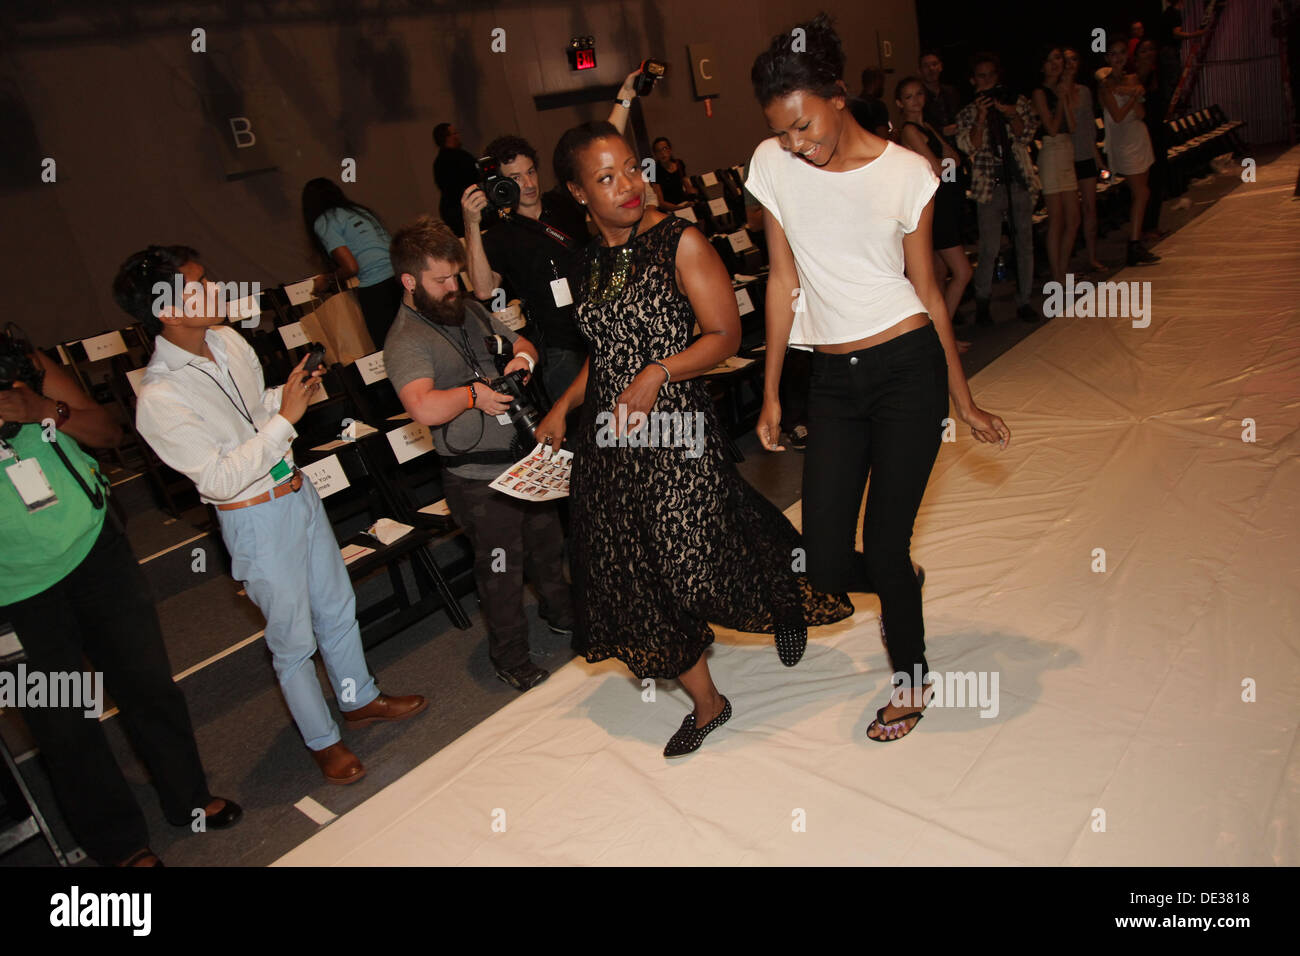 September 8, 2013 - New York, New York, U.S. - Fashion designer TRACY REESE (black lace dress) with models, backstage at Mercedes-Benz Spring 2014 Fashion Week New York. (Credit Image: © Jodi Jones/ZUMA Wire/ZUMAPRESS.com) - Stock Image